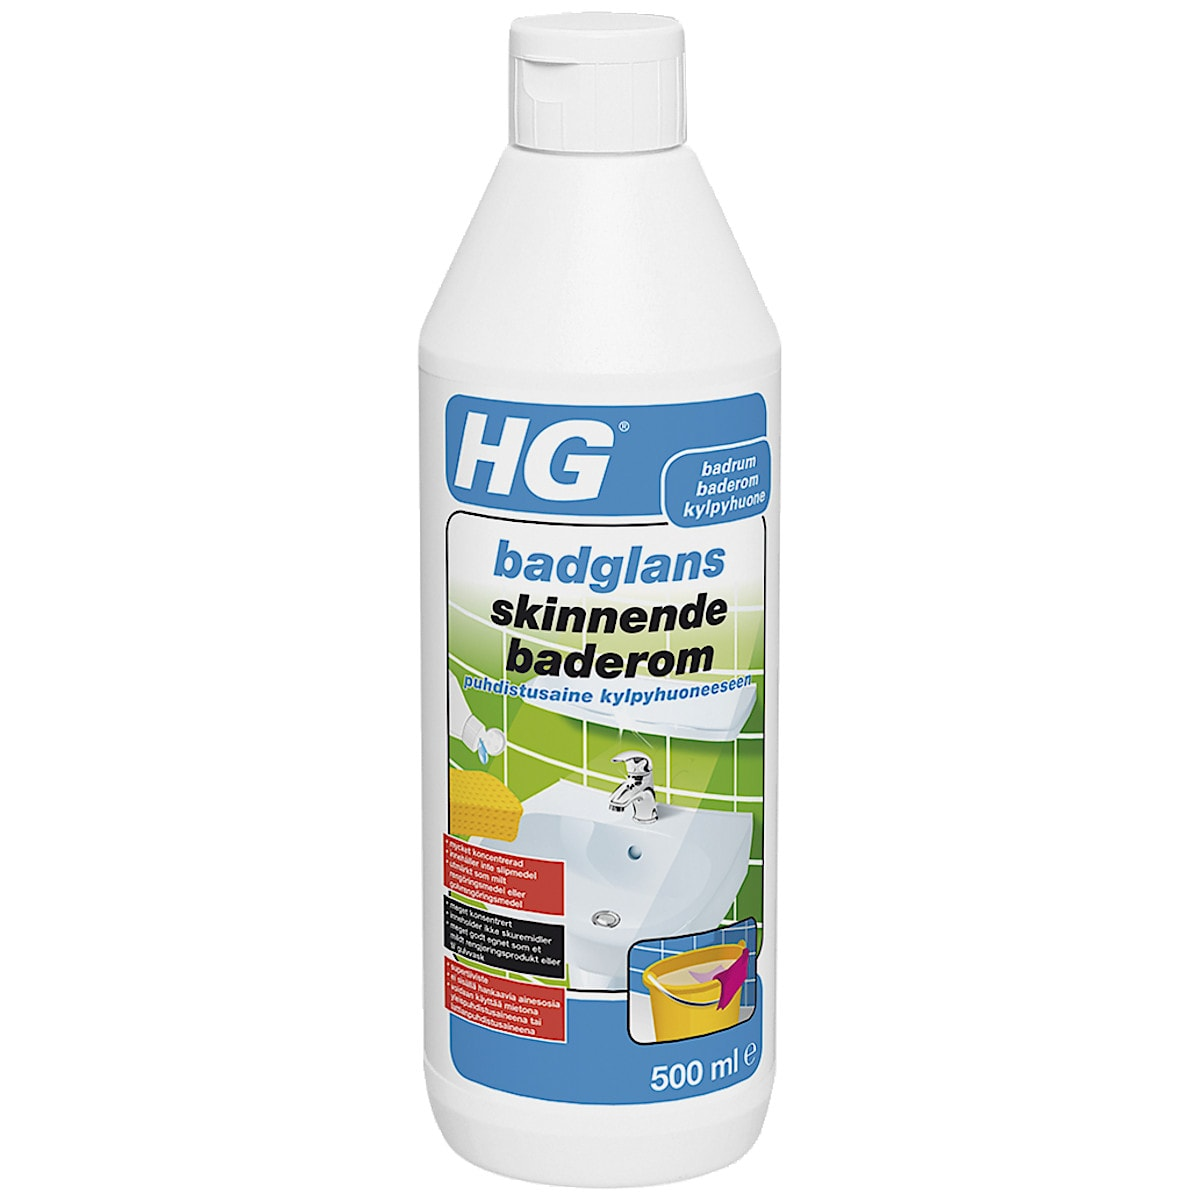 Badglans HG